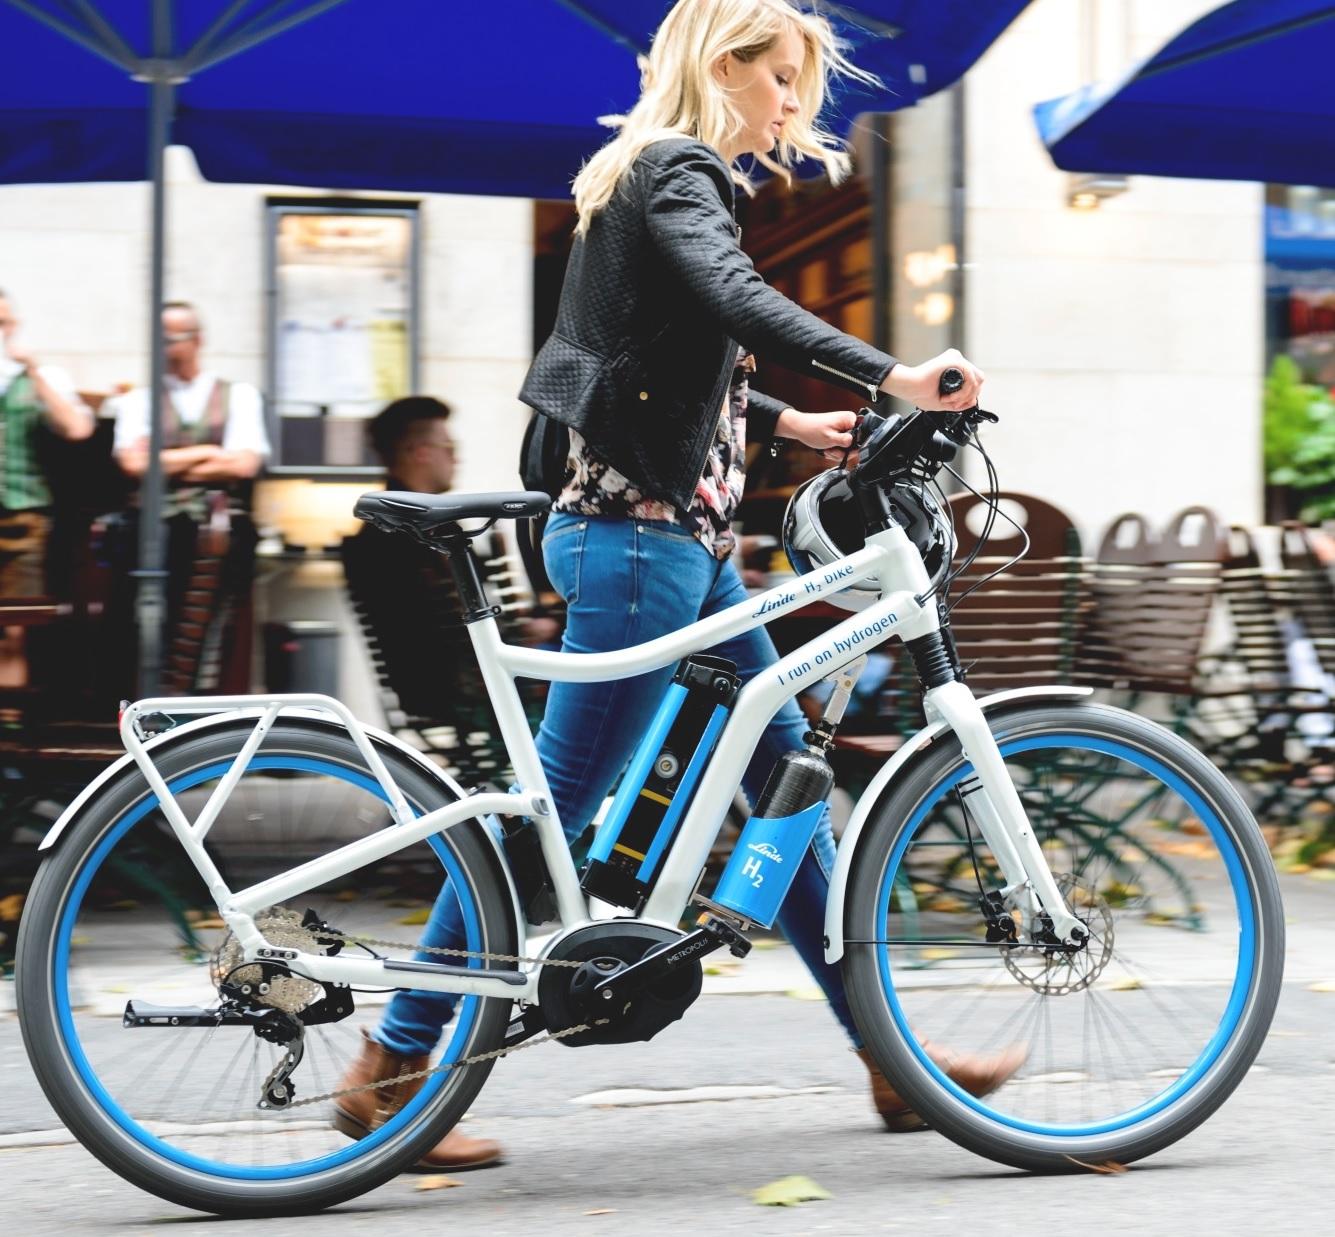 Multi Billion Tech Company Launches Fuel Cell Powered E Bike Bike Europe